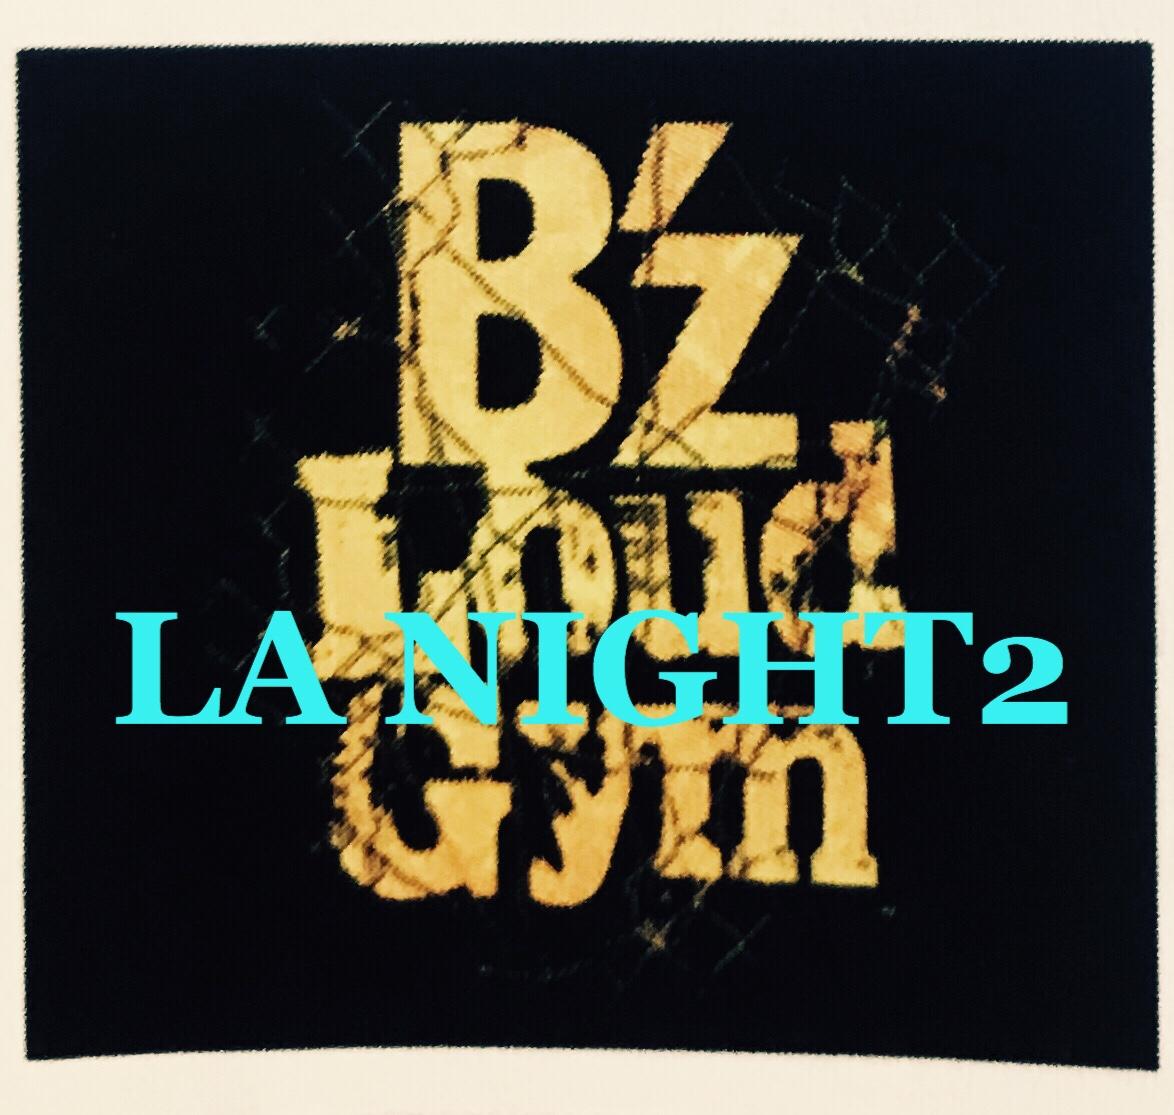 Bz-LAnight